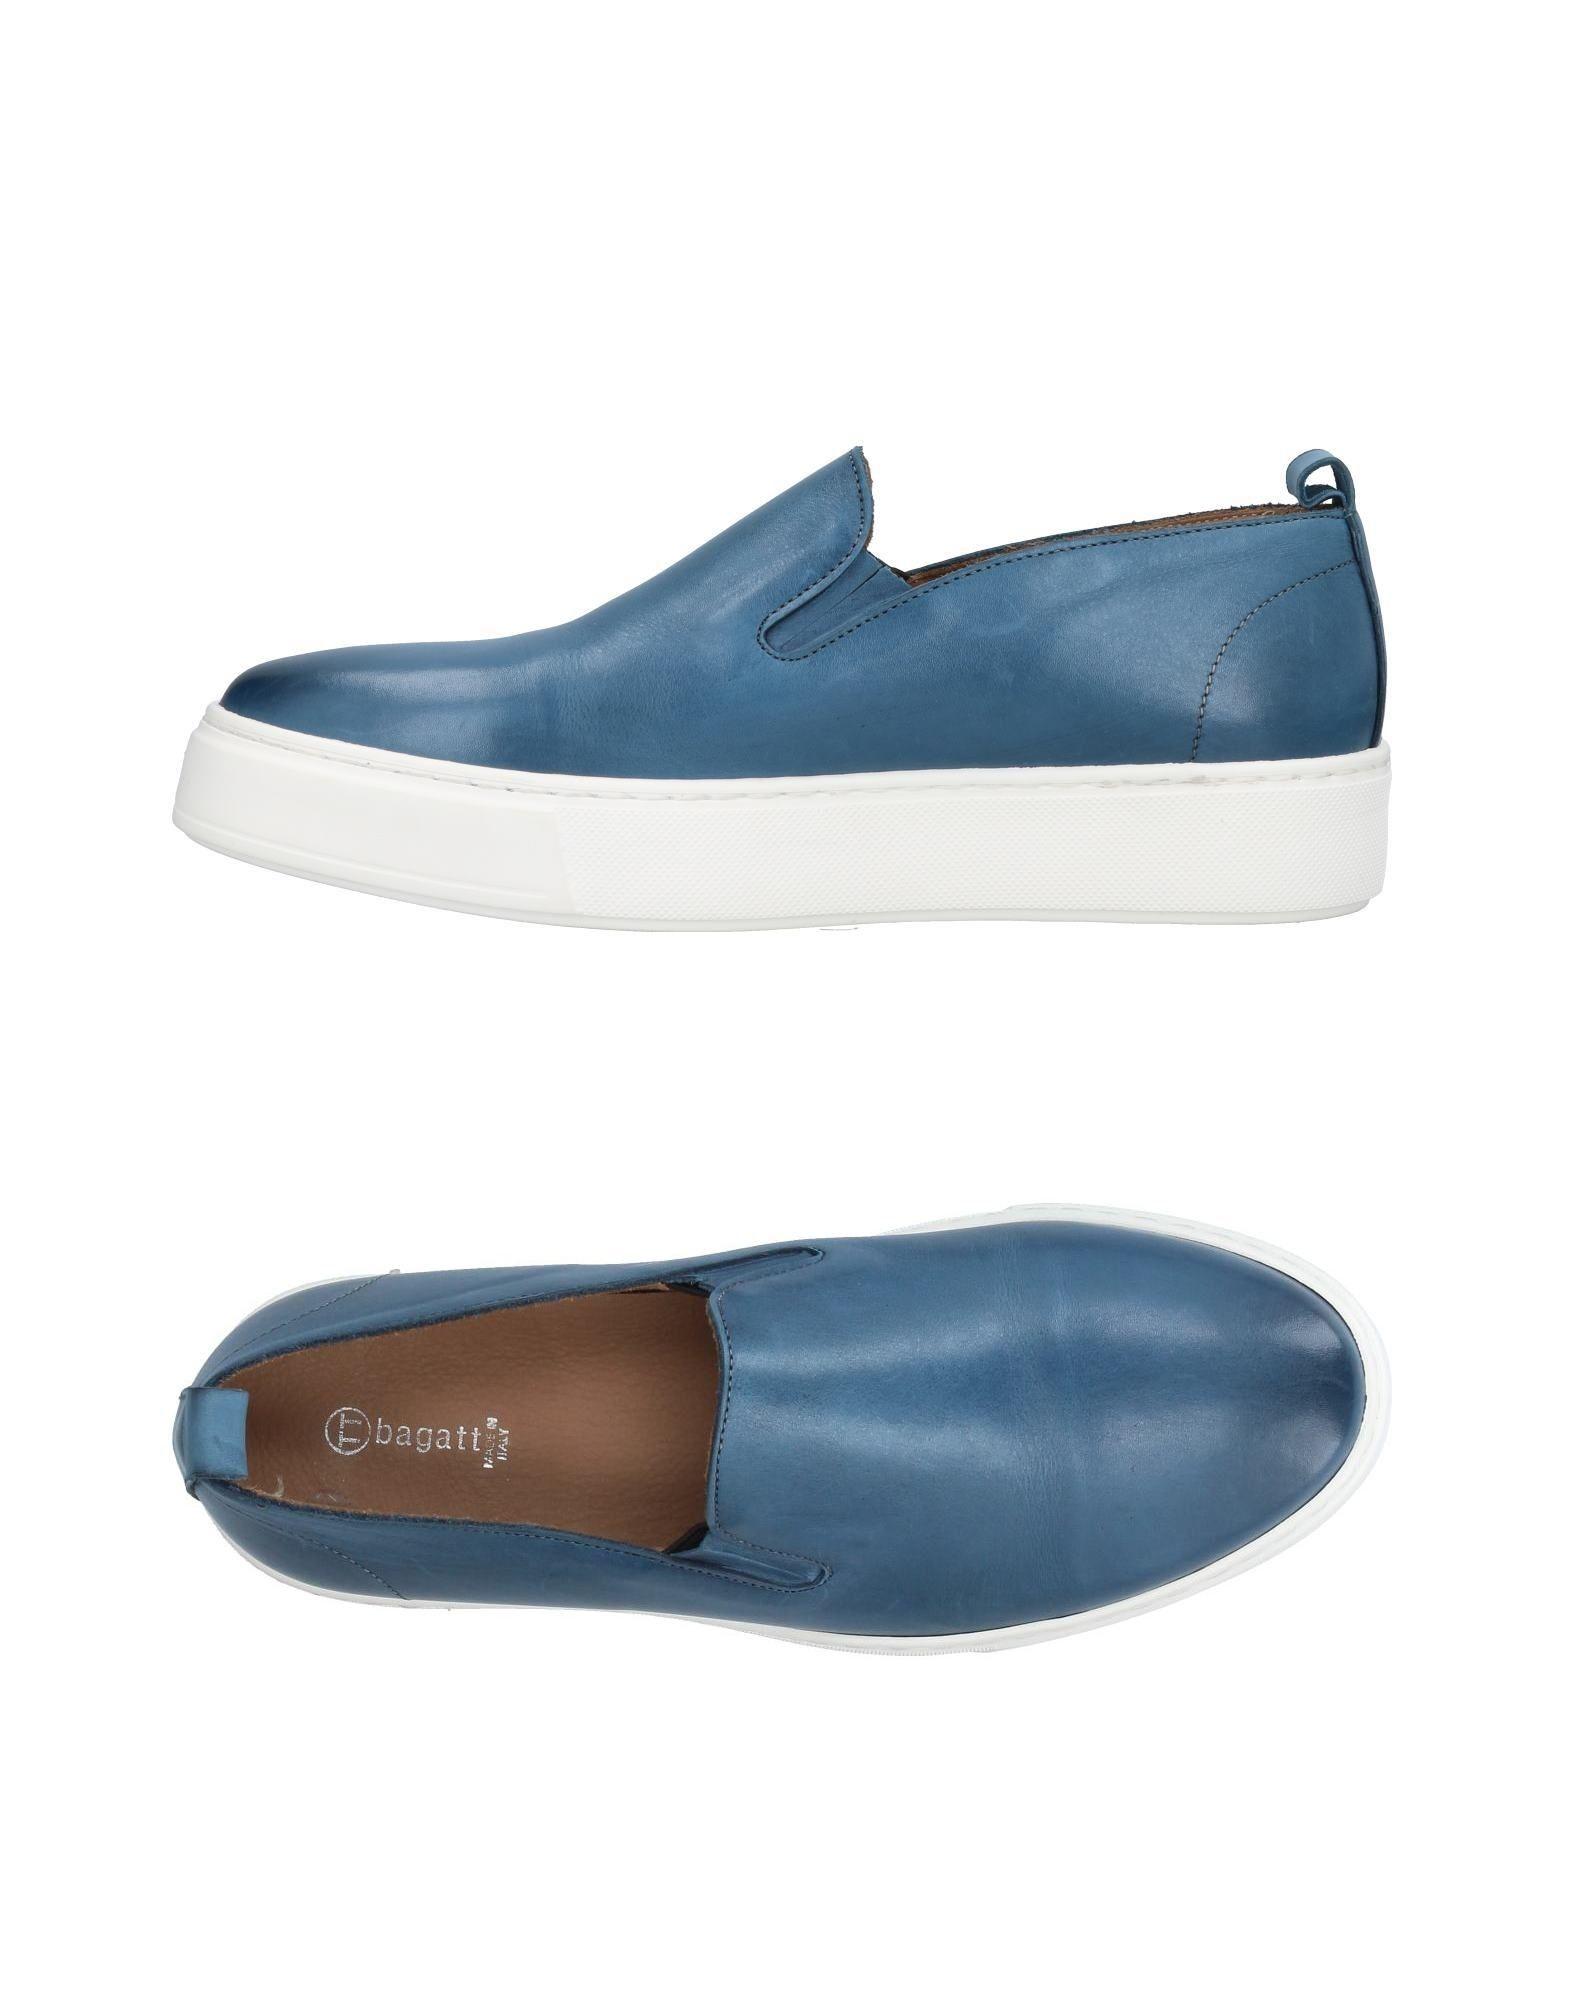 Sneakers Bagatt Uomo - Acquista online su